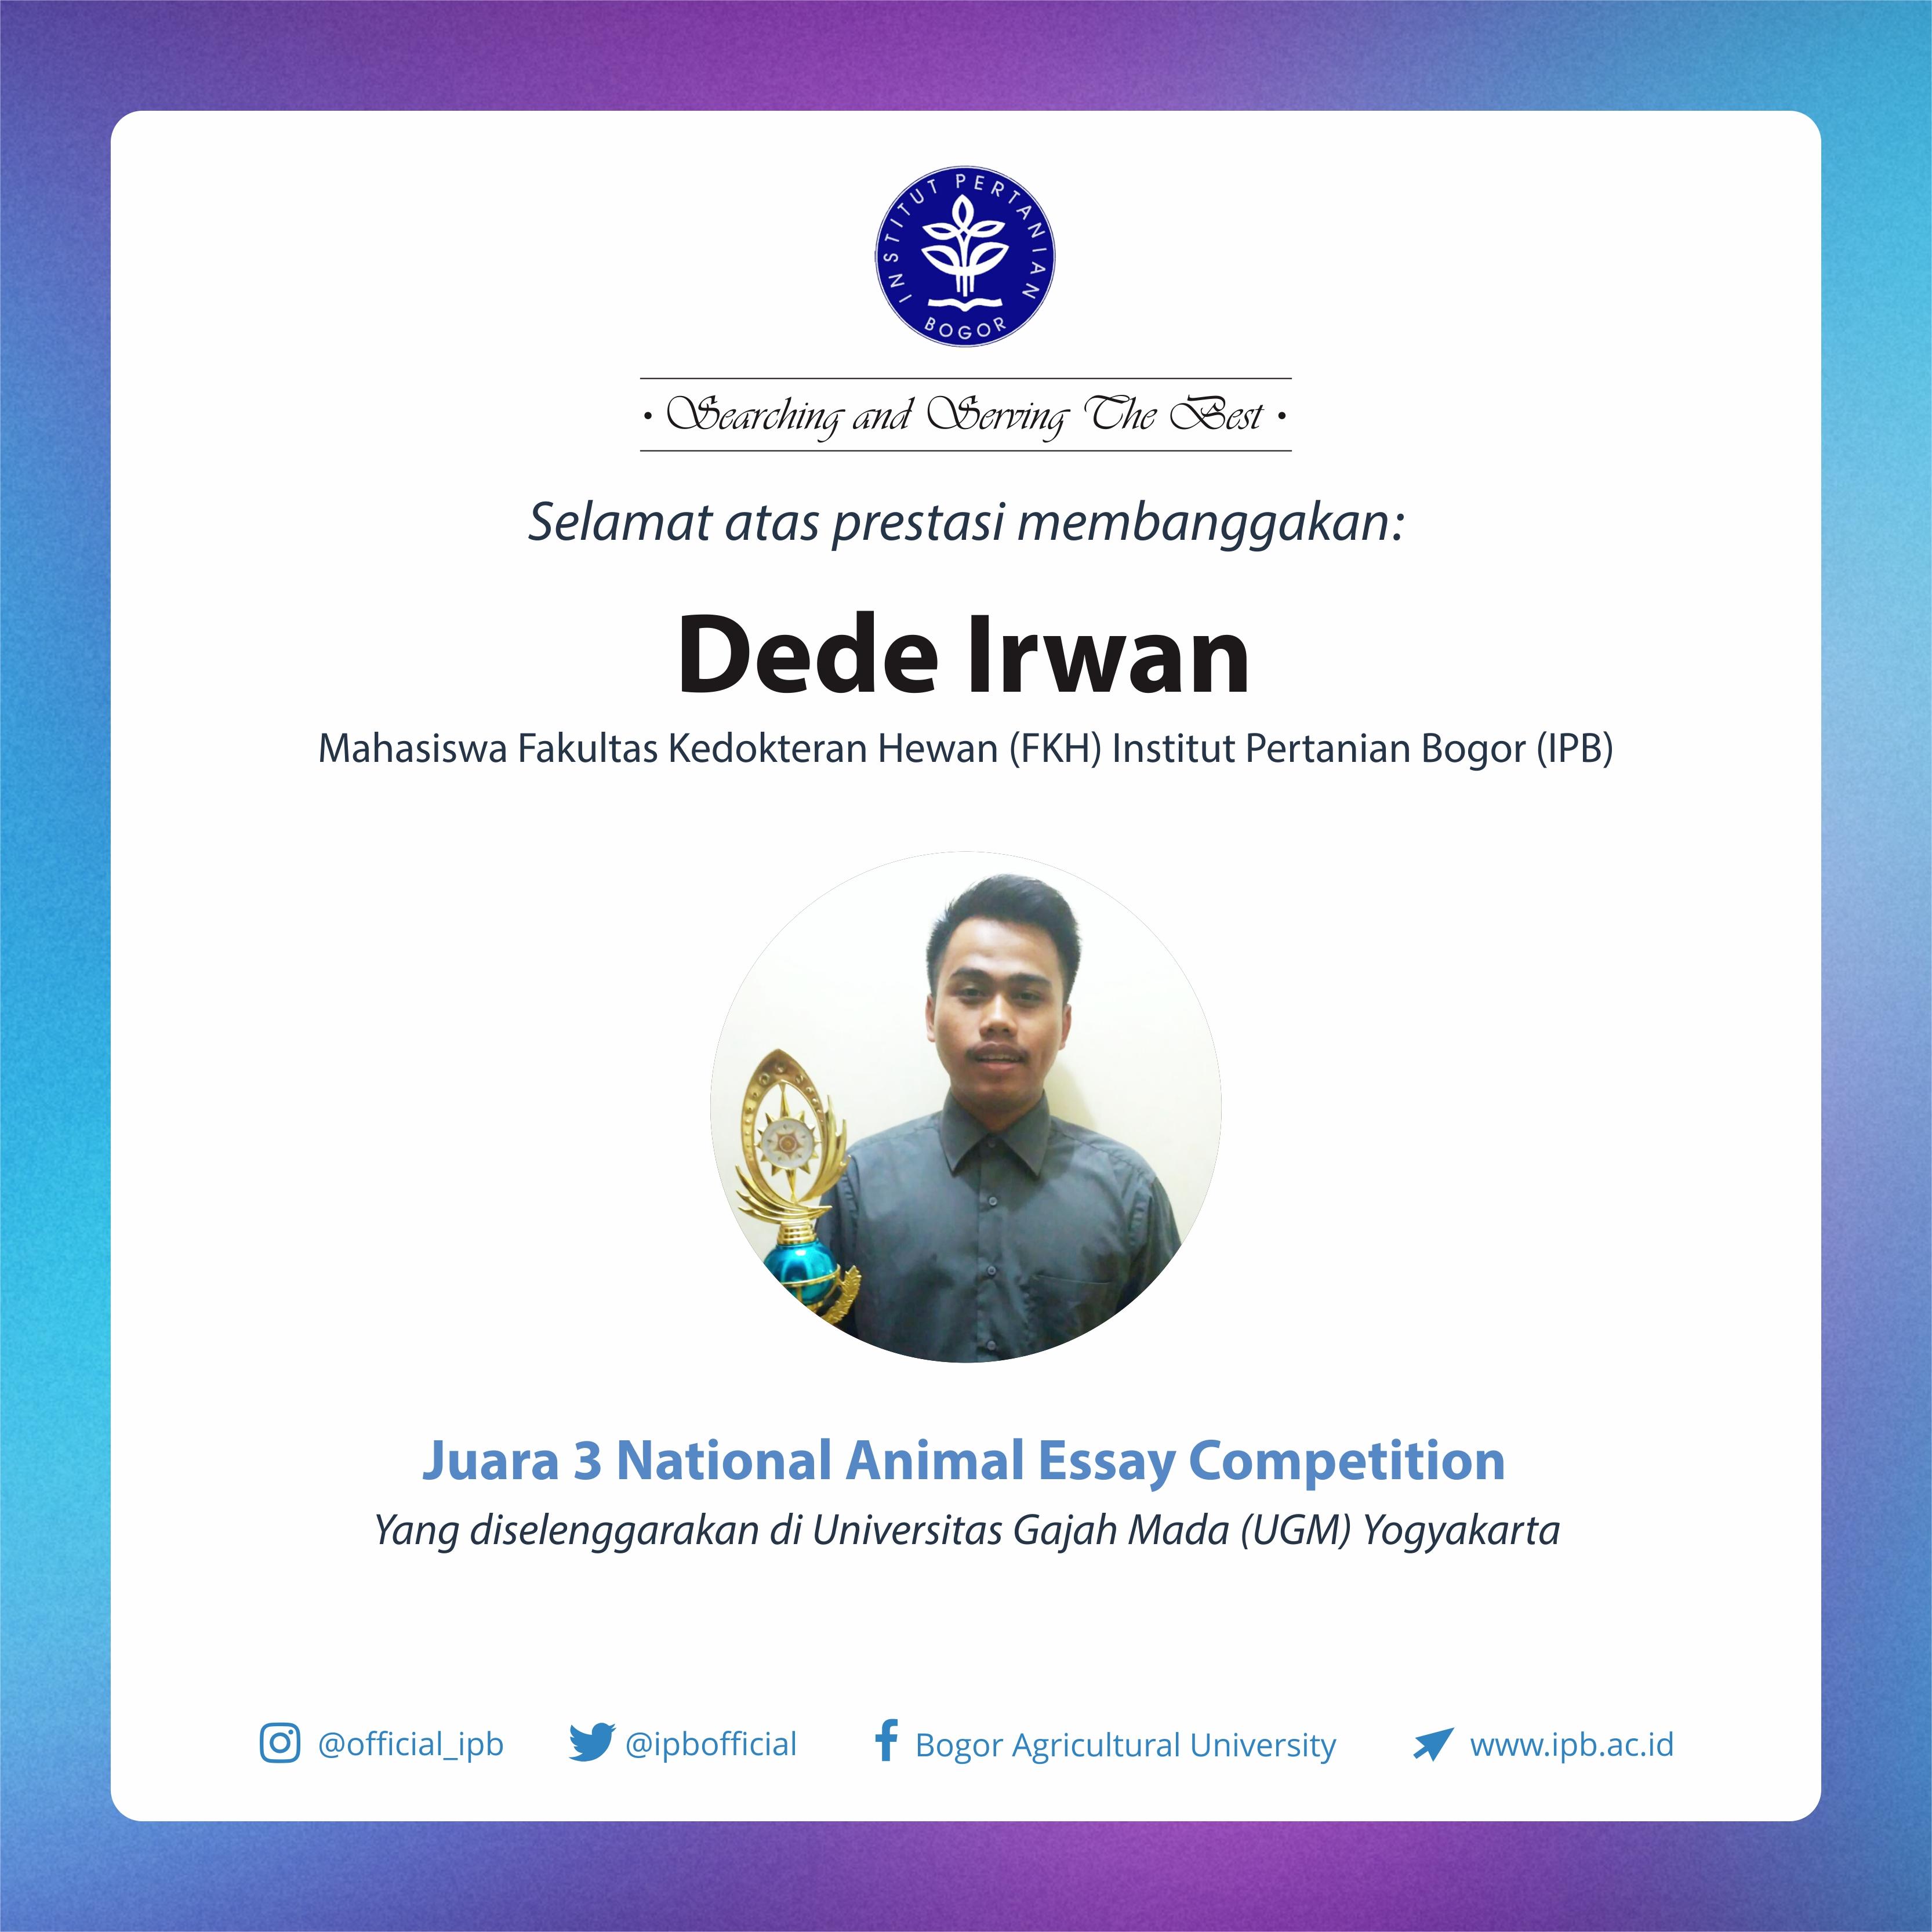 Dede Irwan, Juara 3 Nasional Animal Essay Competition UGM